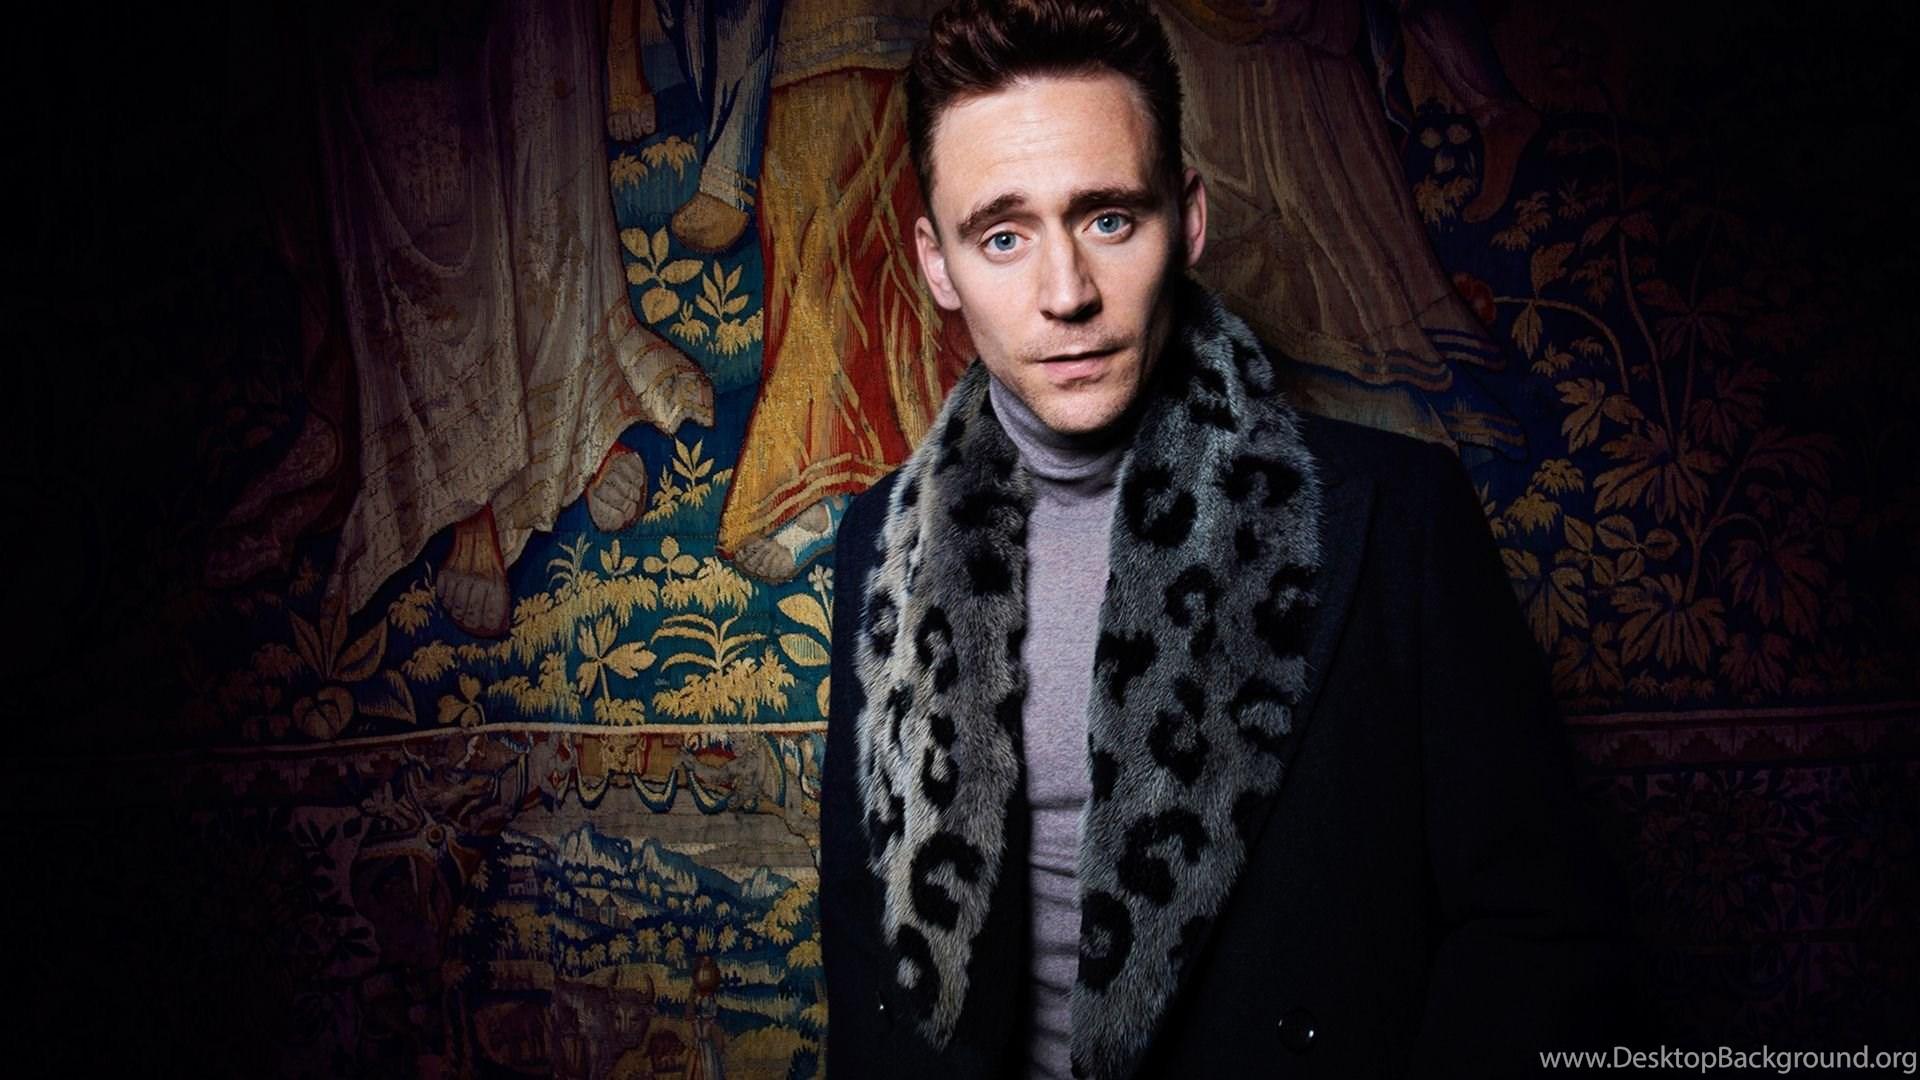 Tom Hiddleston Wallpapers HD HdCoolWallpapersCom Desktop Background